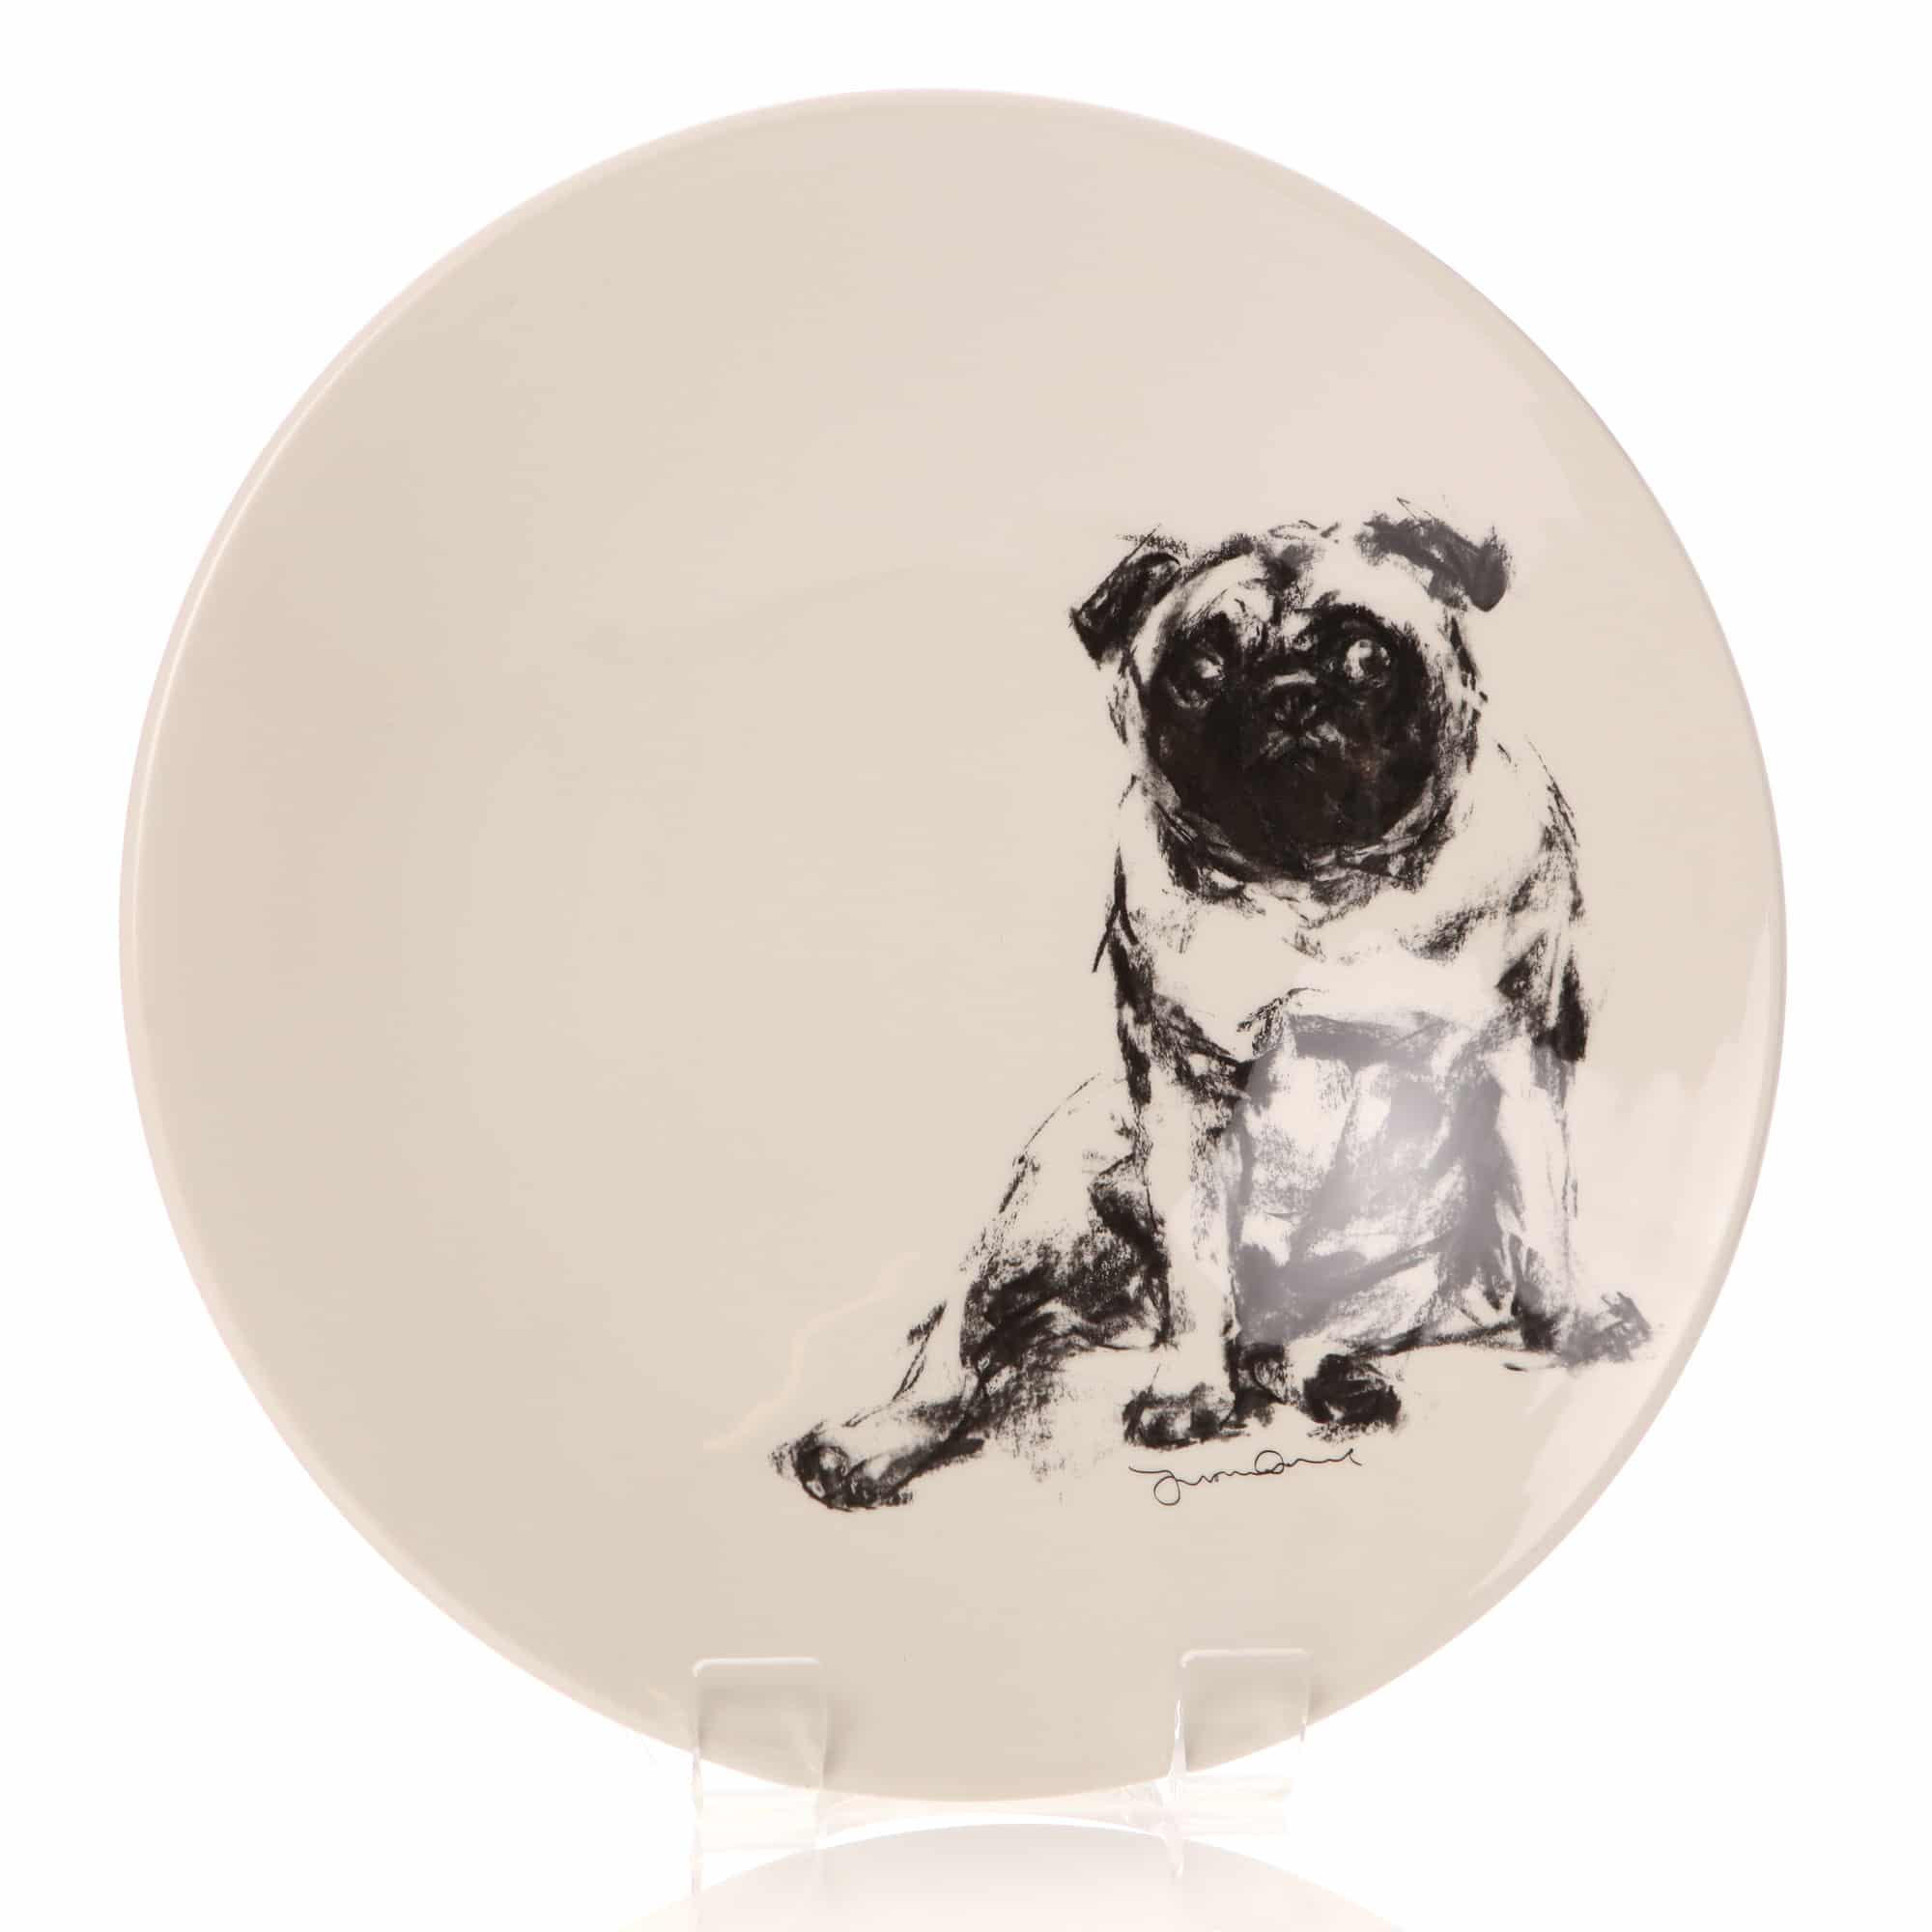 Justine Osborne fine art large shallow bowl of a pug lolling